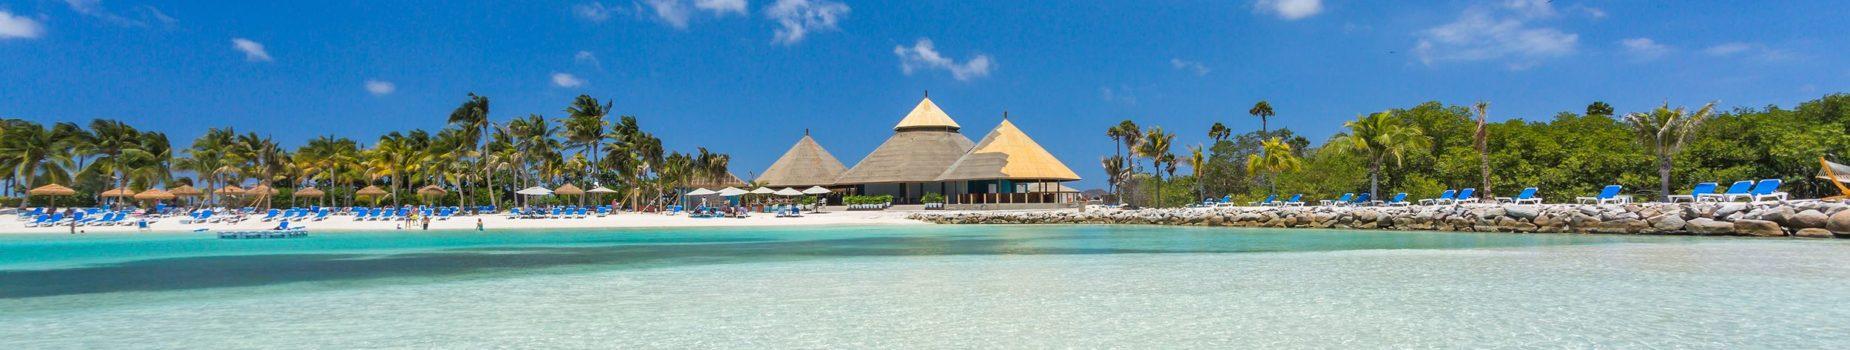 Fly Drive Aruba